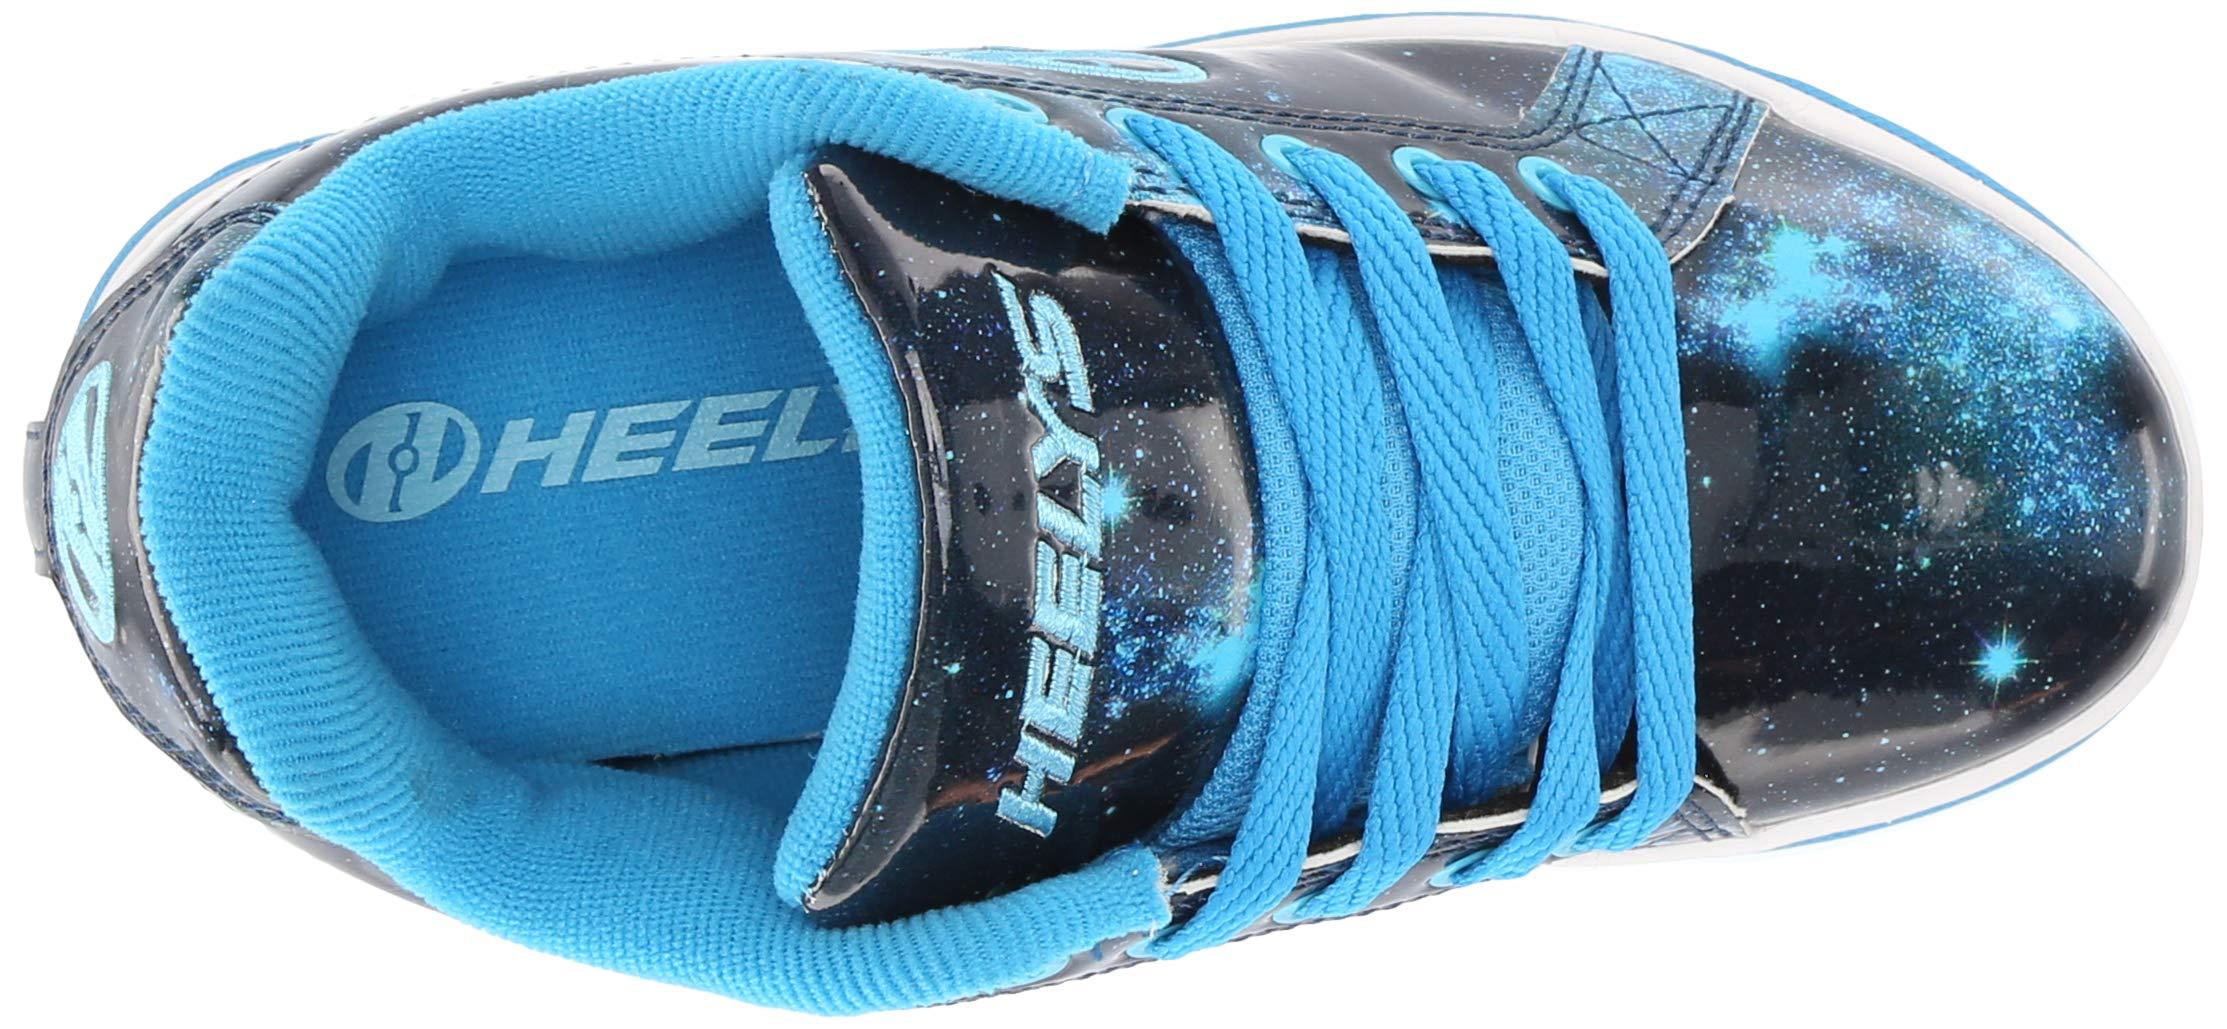 Heelys Girls' Split Tennis Shoe Blue/Galaxy 2 M US Big Kid by Heelys (Image #8)